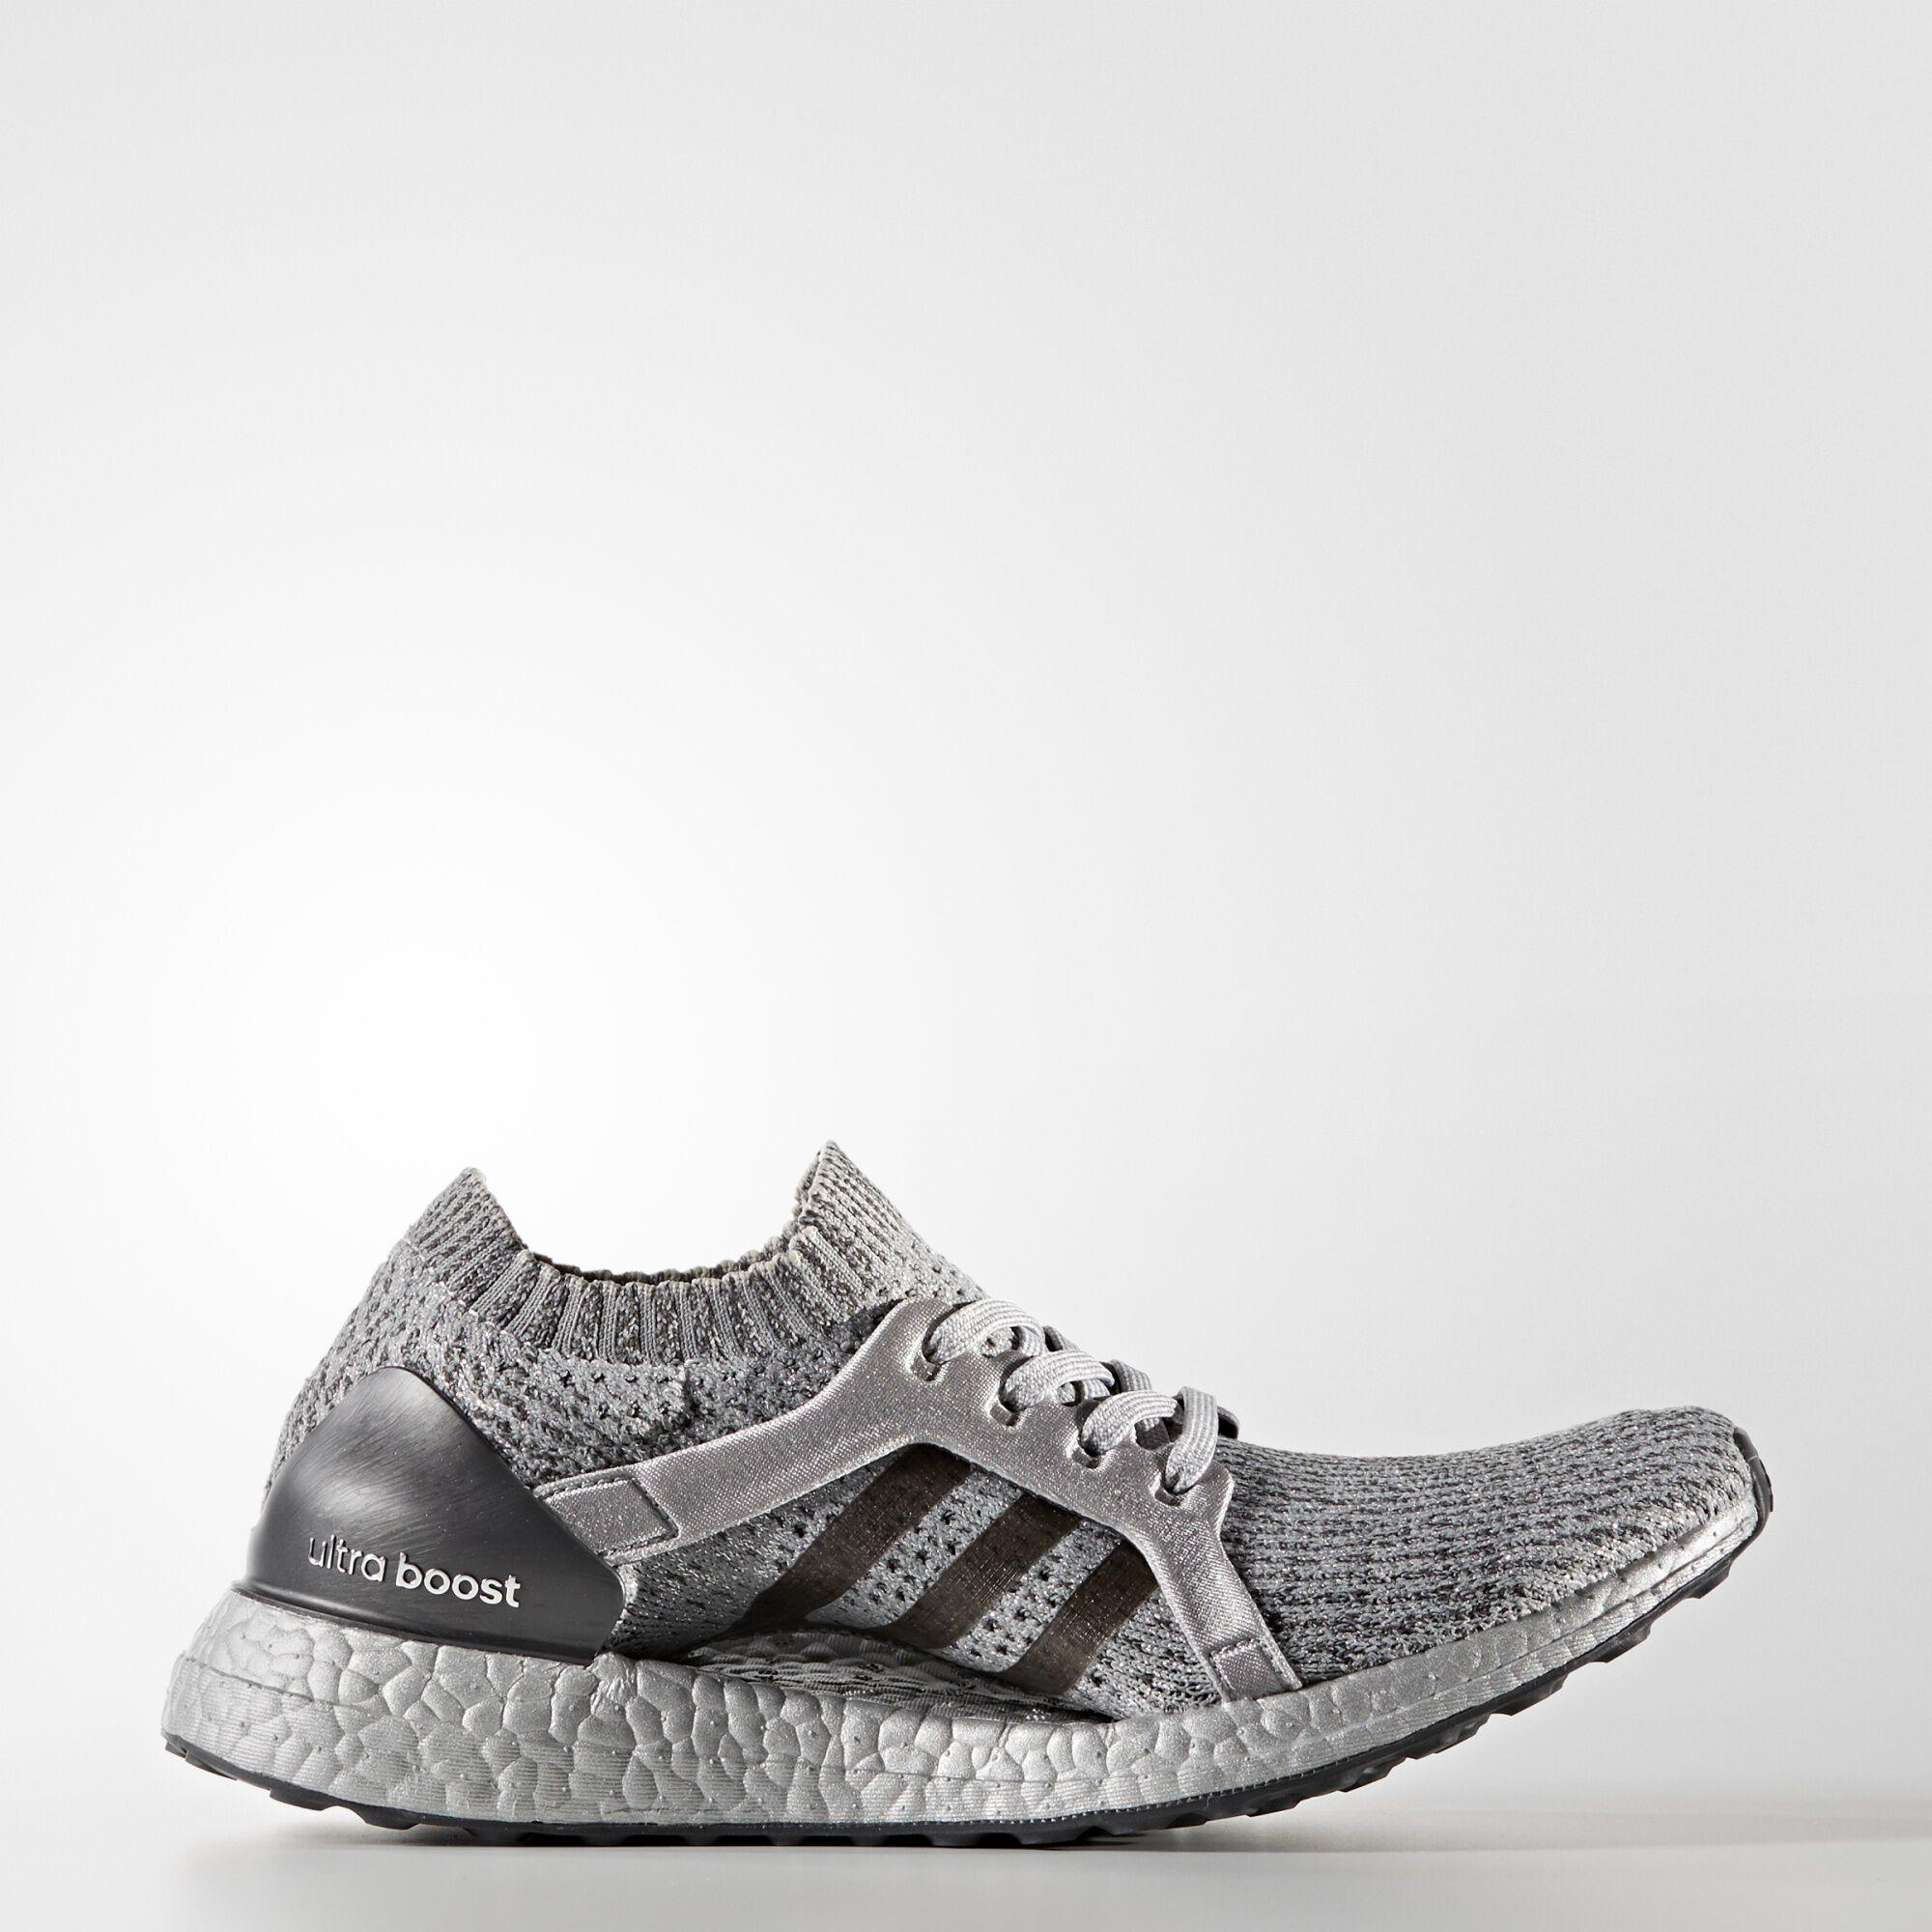 gray adidas superstars white stripes adidas ultra boost black met gold